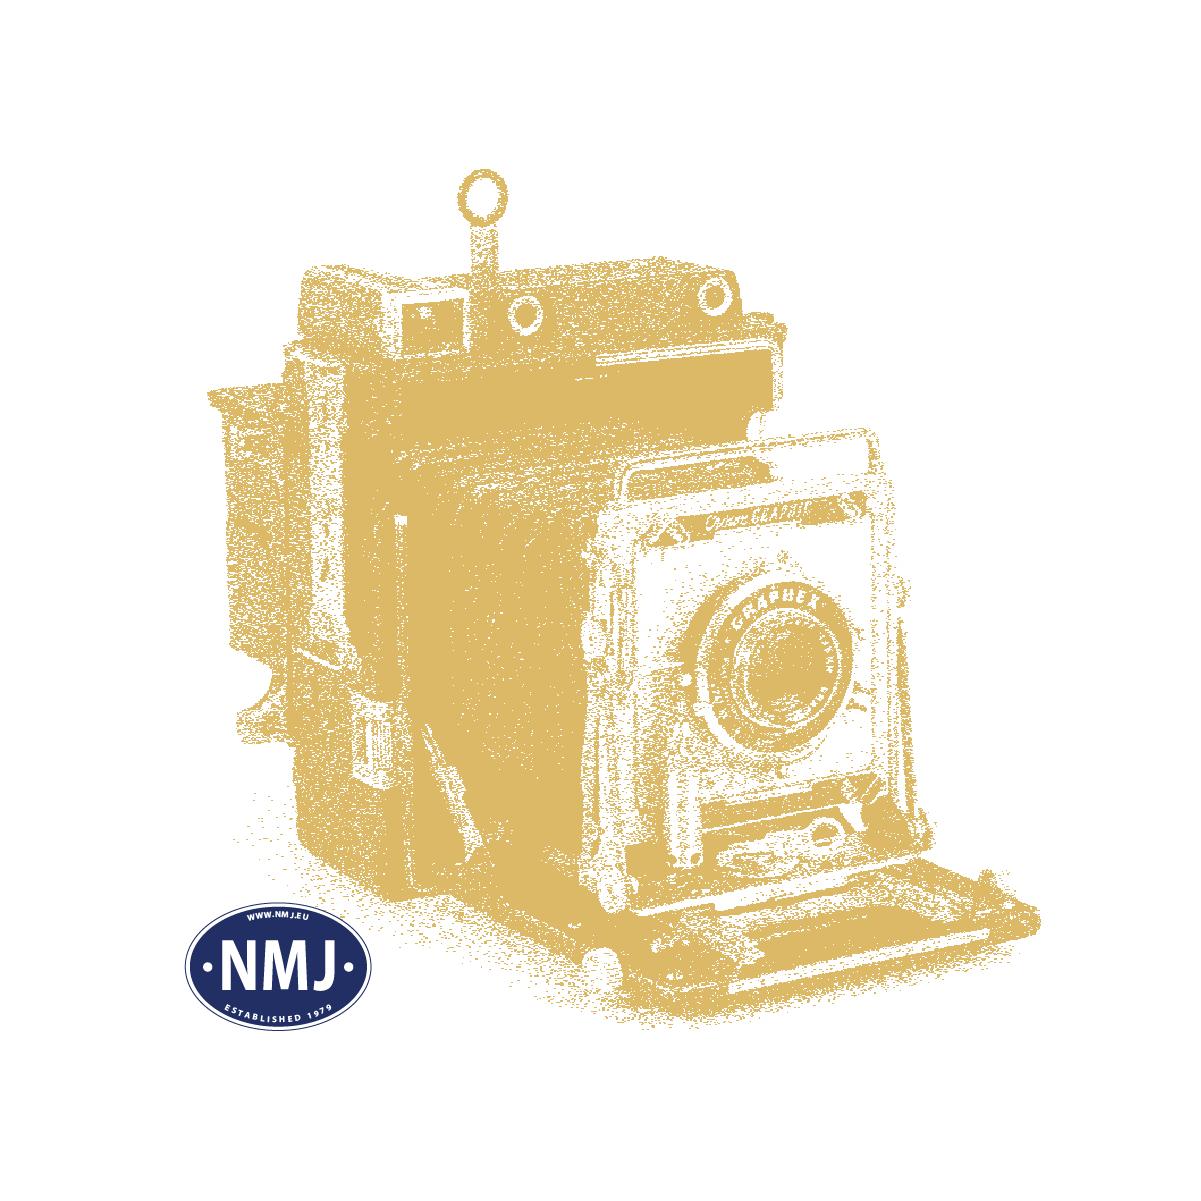 NMJB1136 - Canon CN-22, Flywheel Mass (2 Pcs.), Kardan Connection (2 Pcs.), DC motor